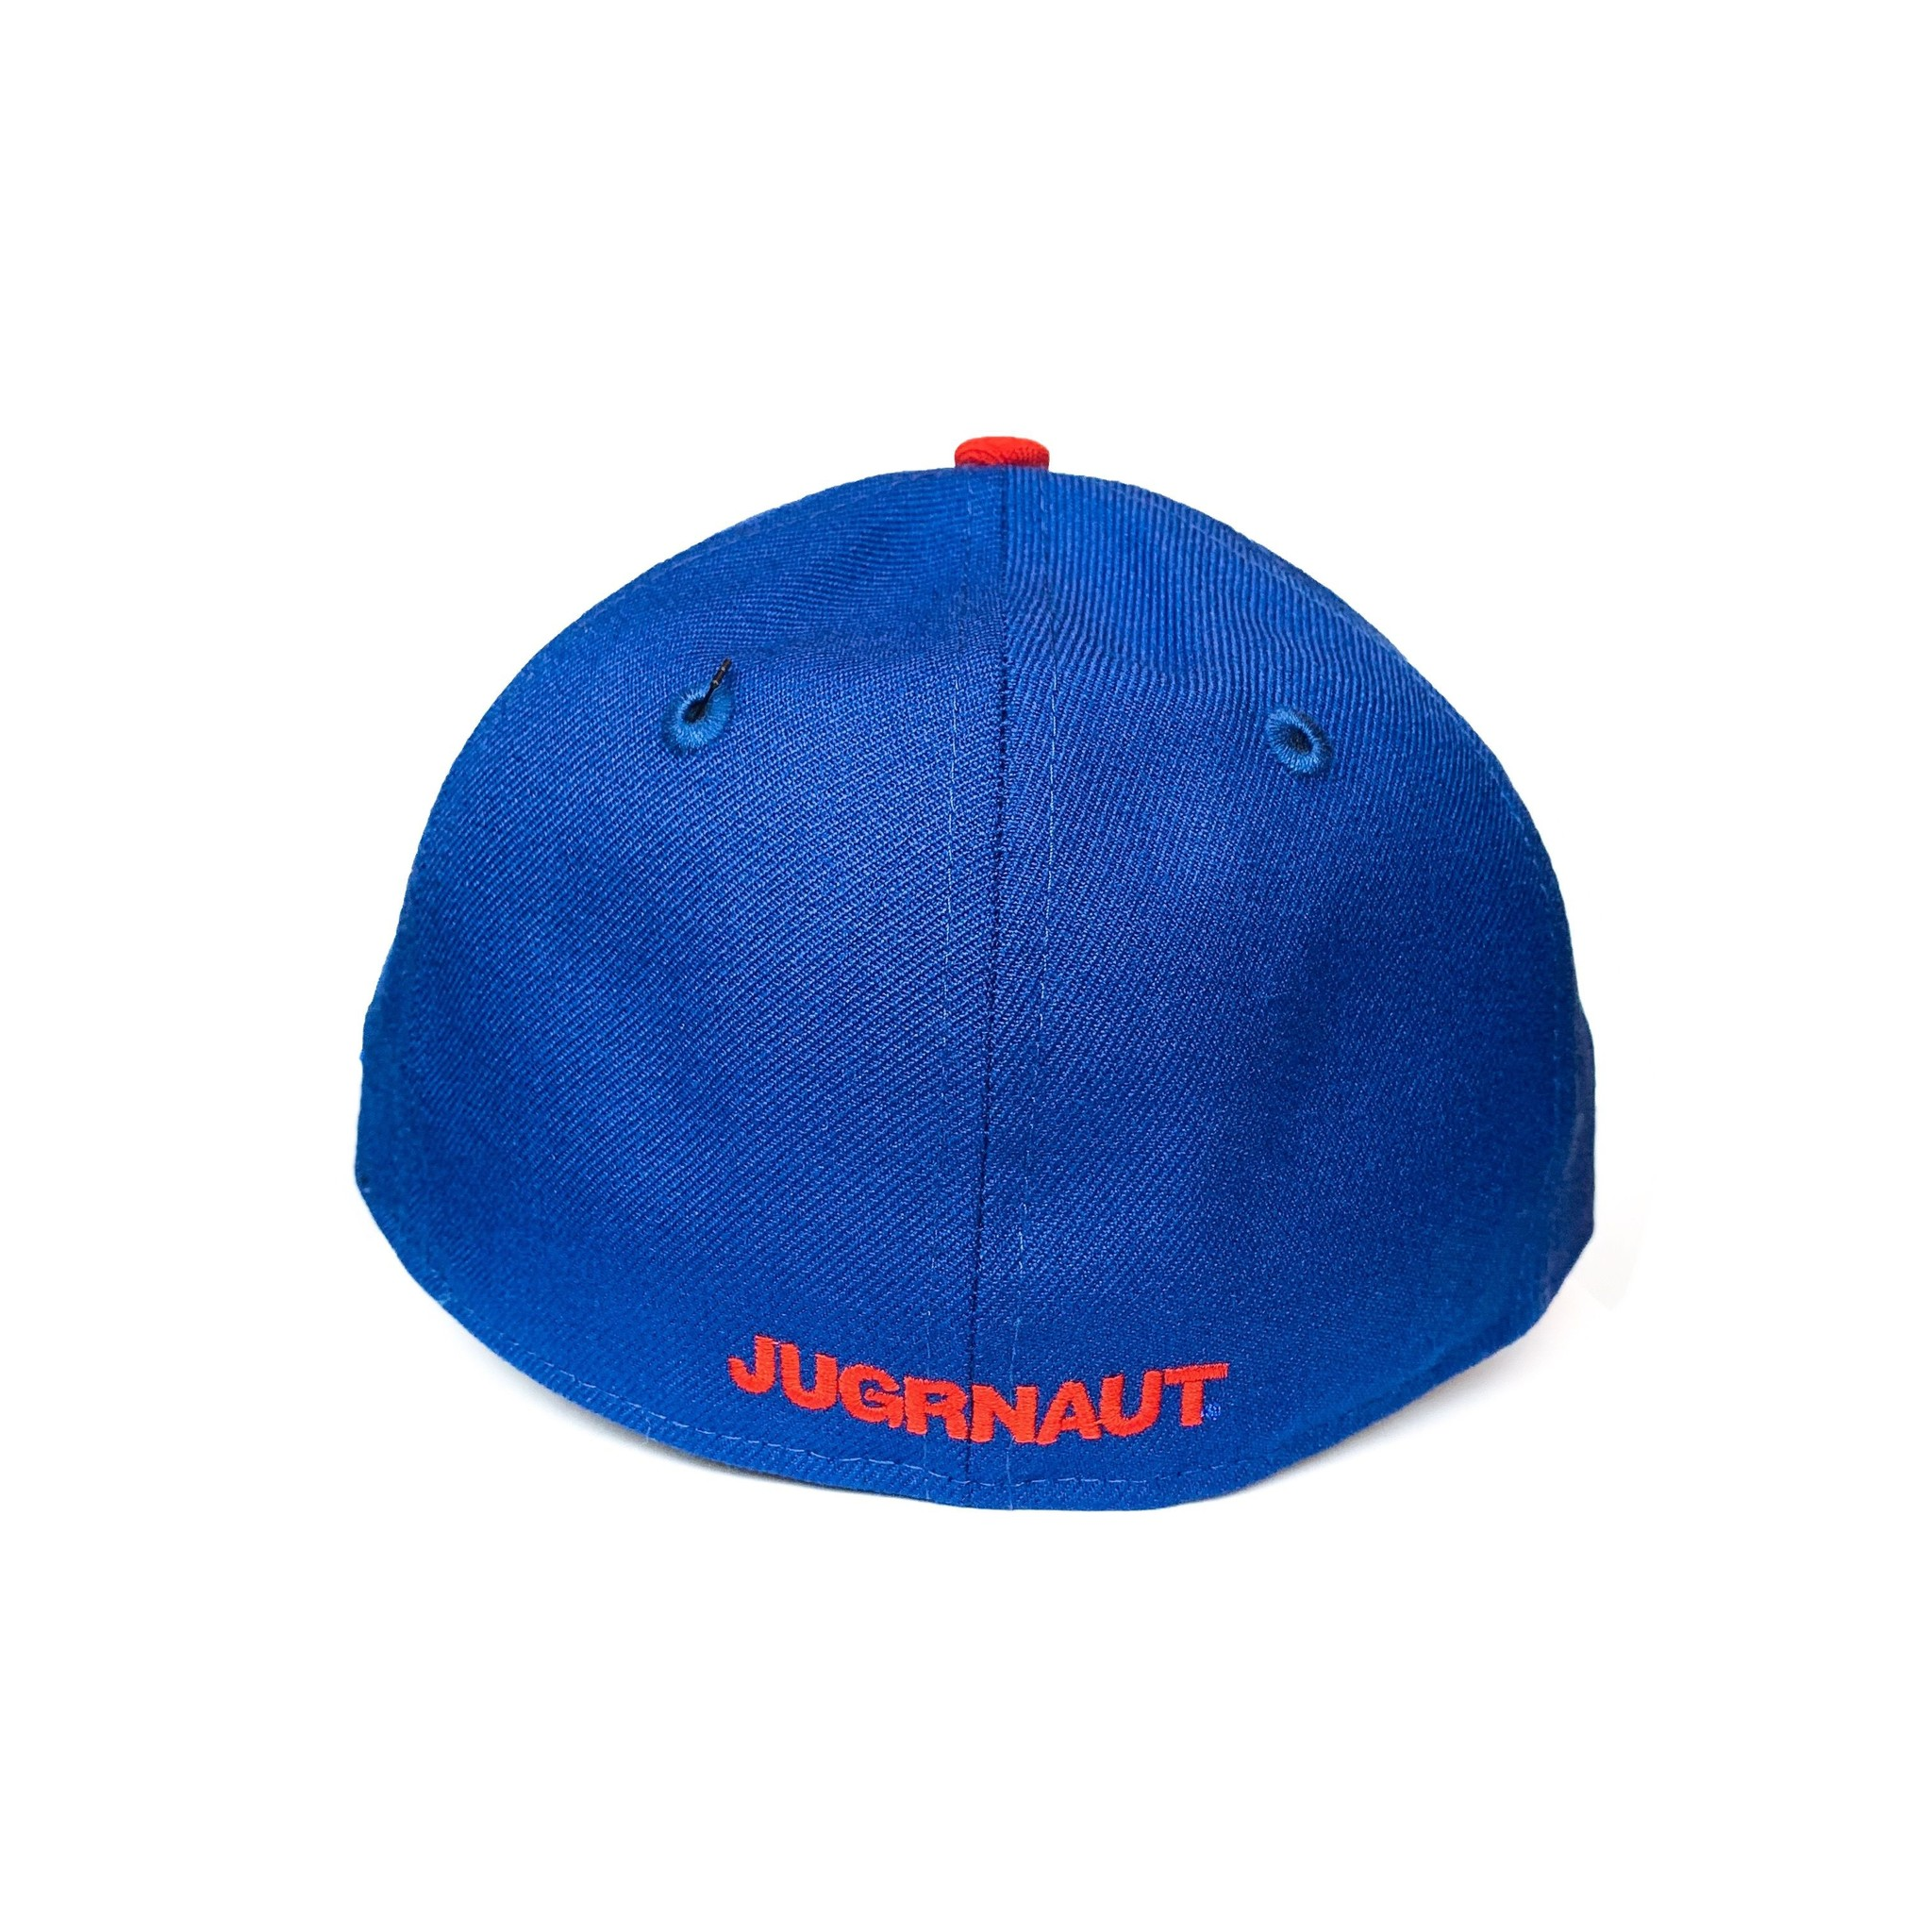 Jugrnaut Jugrnaut x New Era Royal size